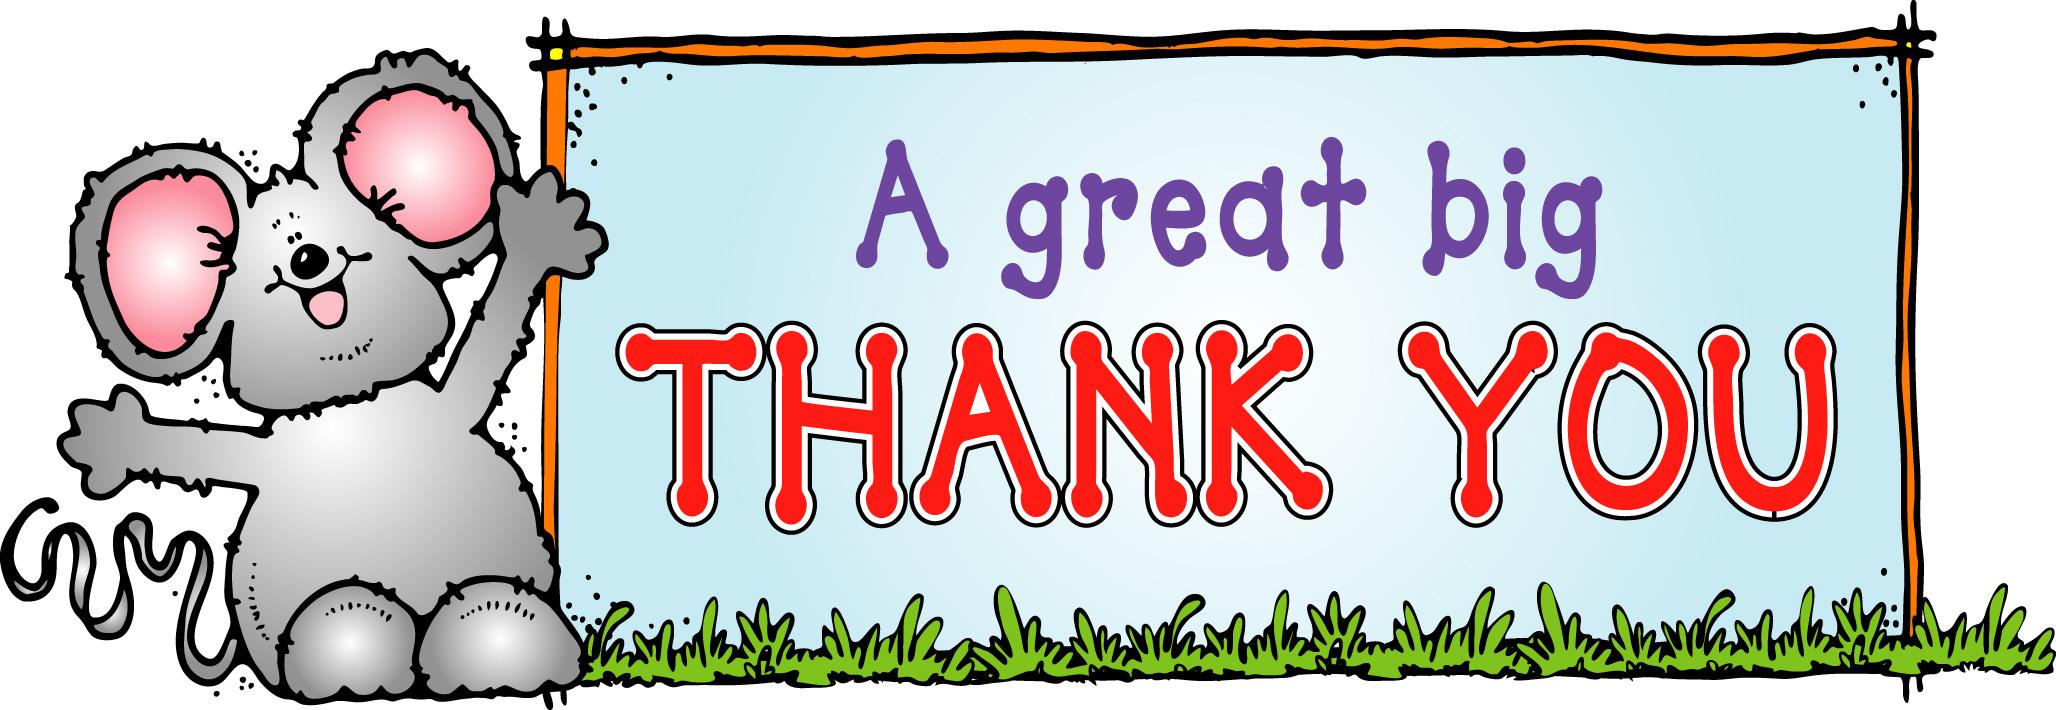 Thank You For Your Help Clip Art Car Tun-Thank You For Your Help Clip Art Car Tuning-7